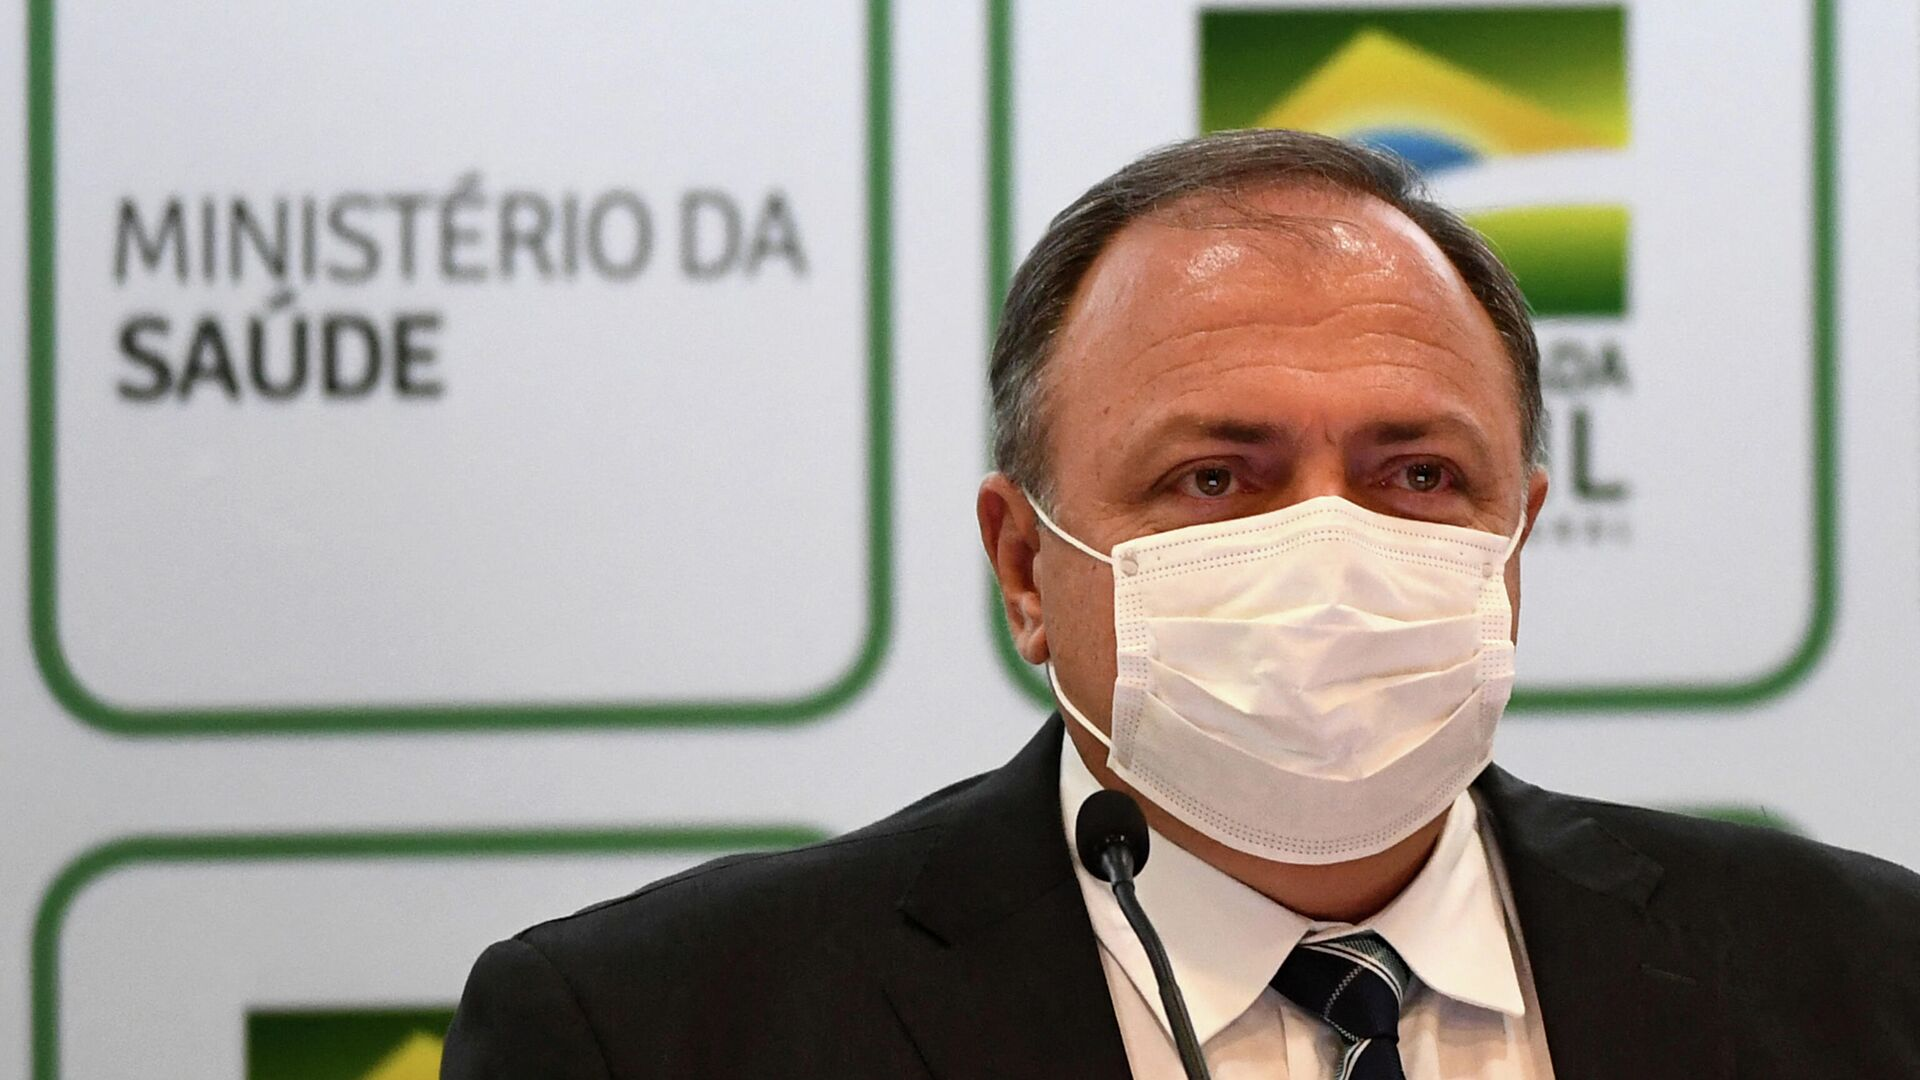 Eduardo Pazuello, exministro de Salud de Brasil - Sputnik Mundo, 1920, 13.05.2021